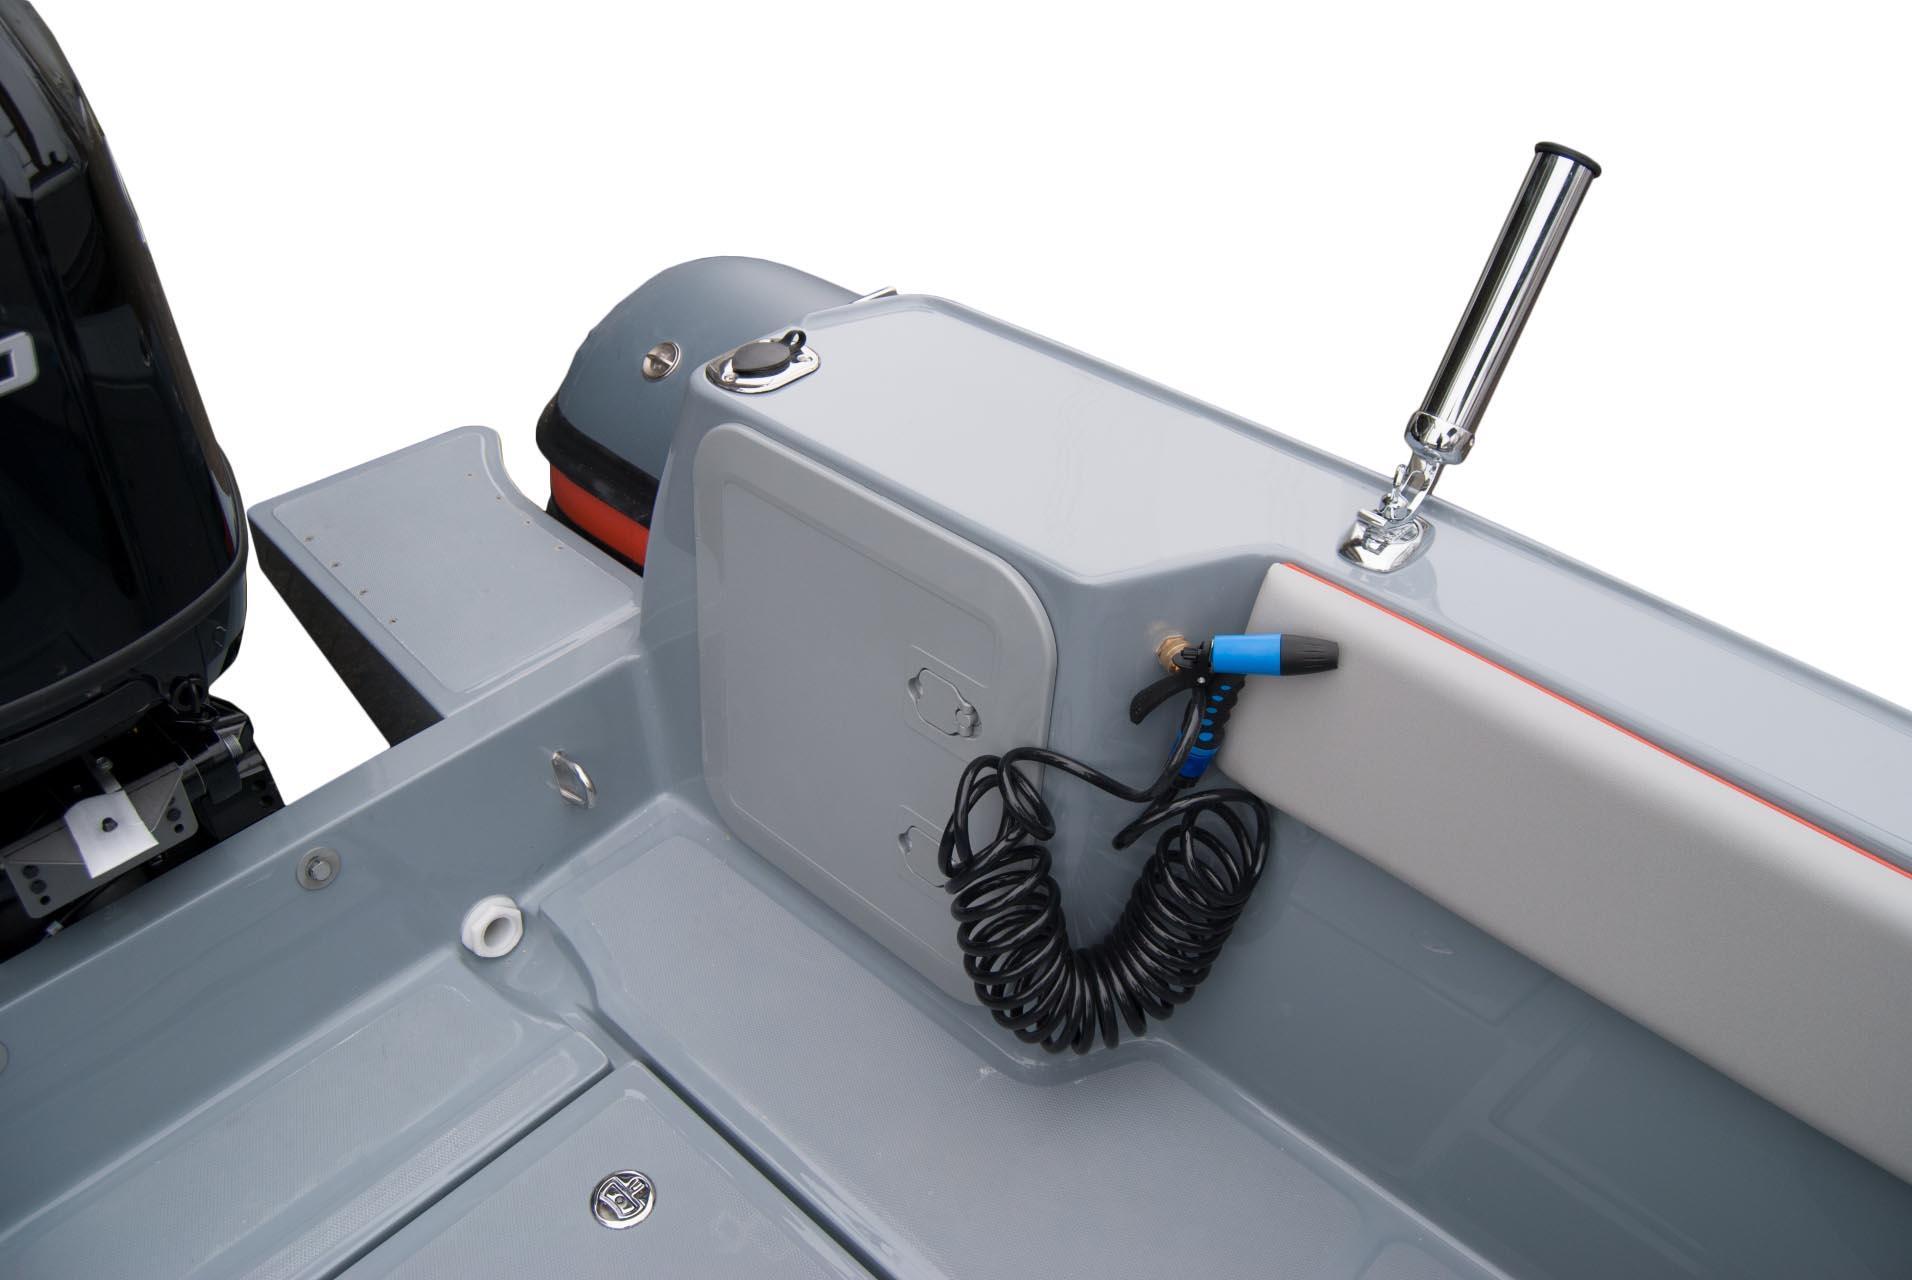 Joker Boat Barracuda deck wash and rod holder